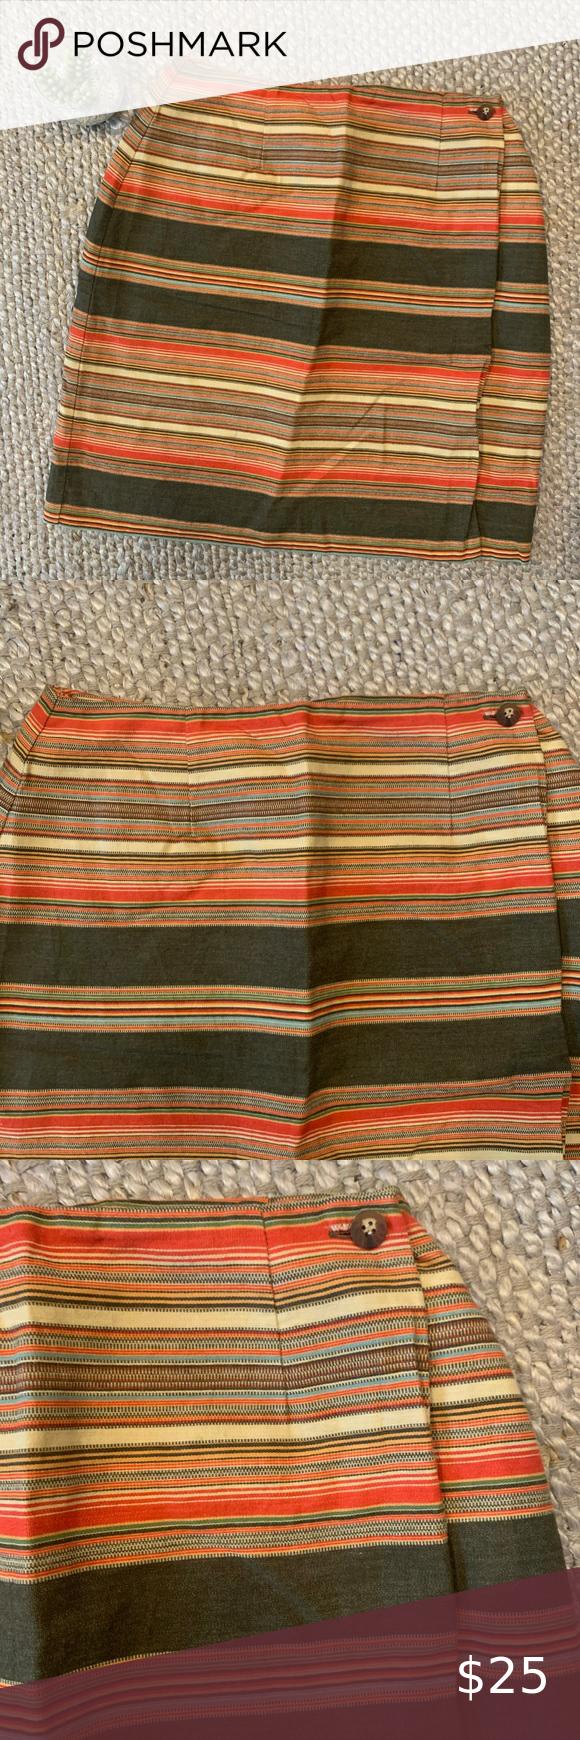 Size 6 Vintage Southwest Wrap Skirt